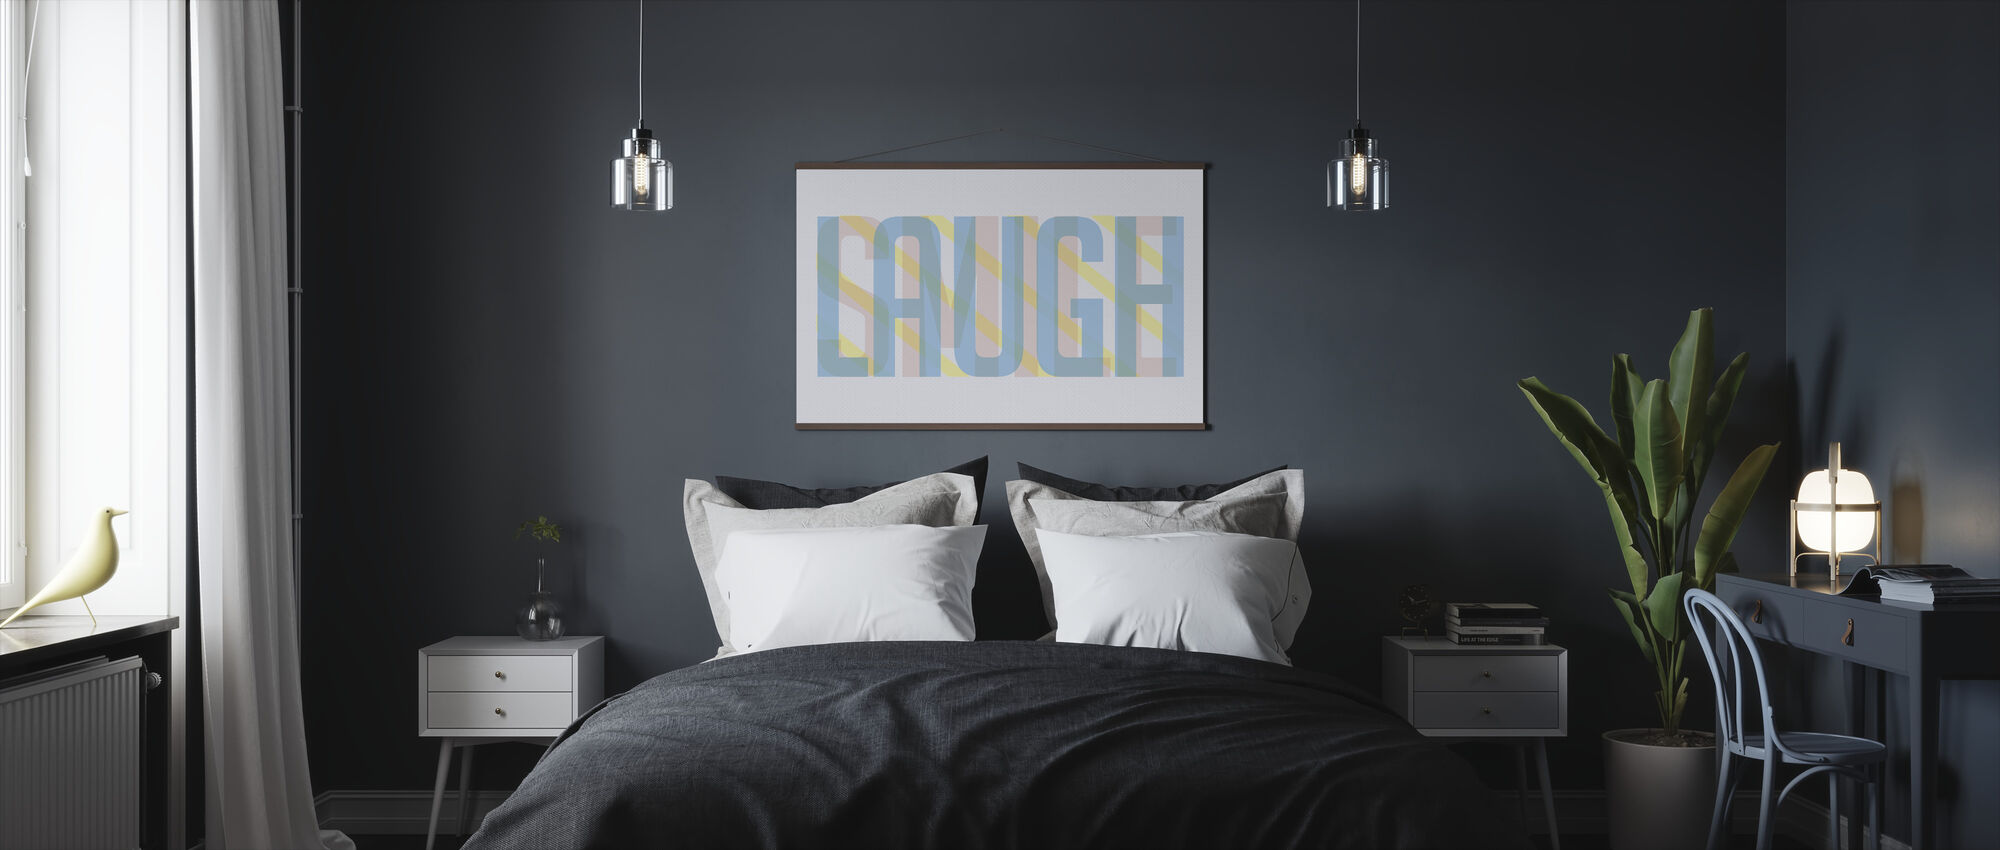 Lach maar - Poster - Slaapkamer